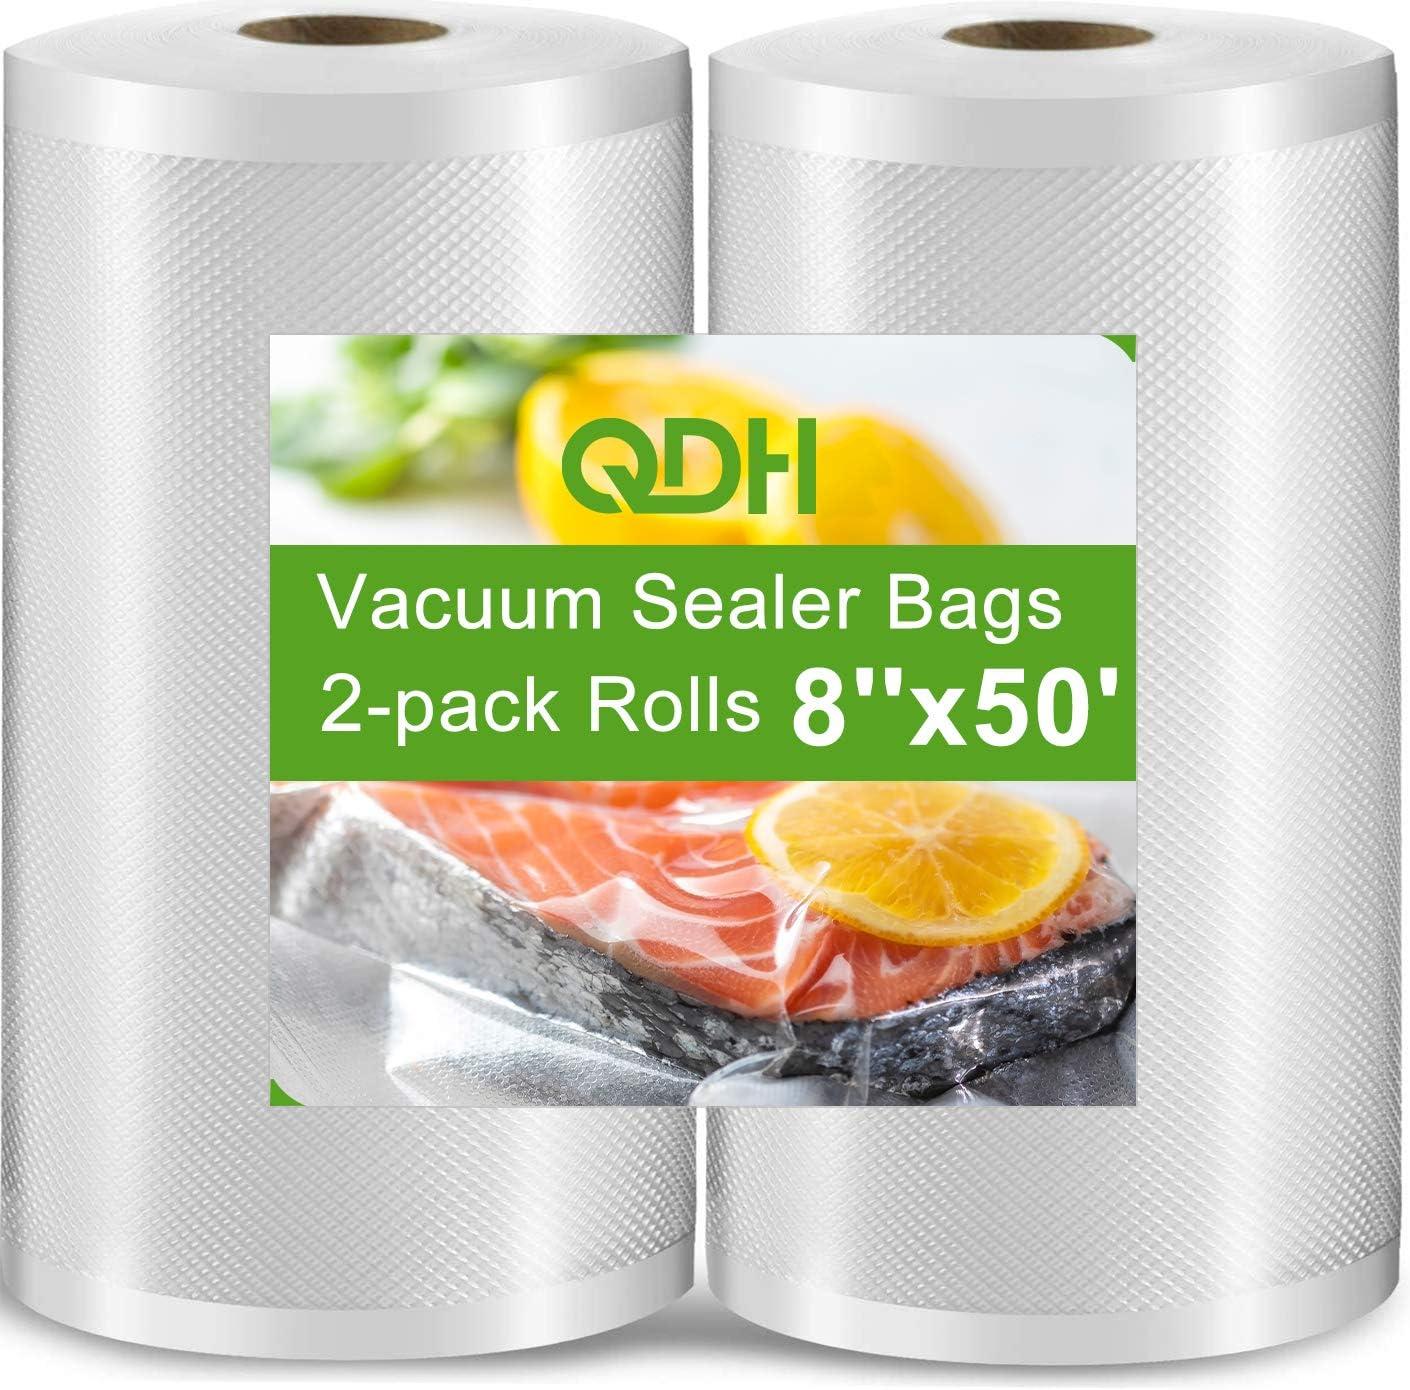 "Vacuum Sealer Bags 8""x50' Rolls 2 pack for Food Saver, Seal Meal. Sous Vide Bag Great for Sous Vide Cooker, Vac Machine, Microwave & Freezer, BPA Free and Commercial Grade Vacuum Sealer bag"